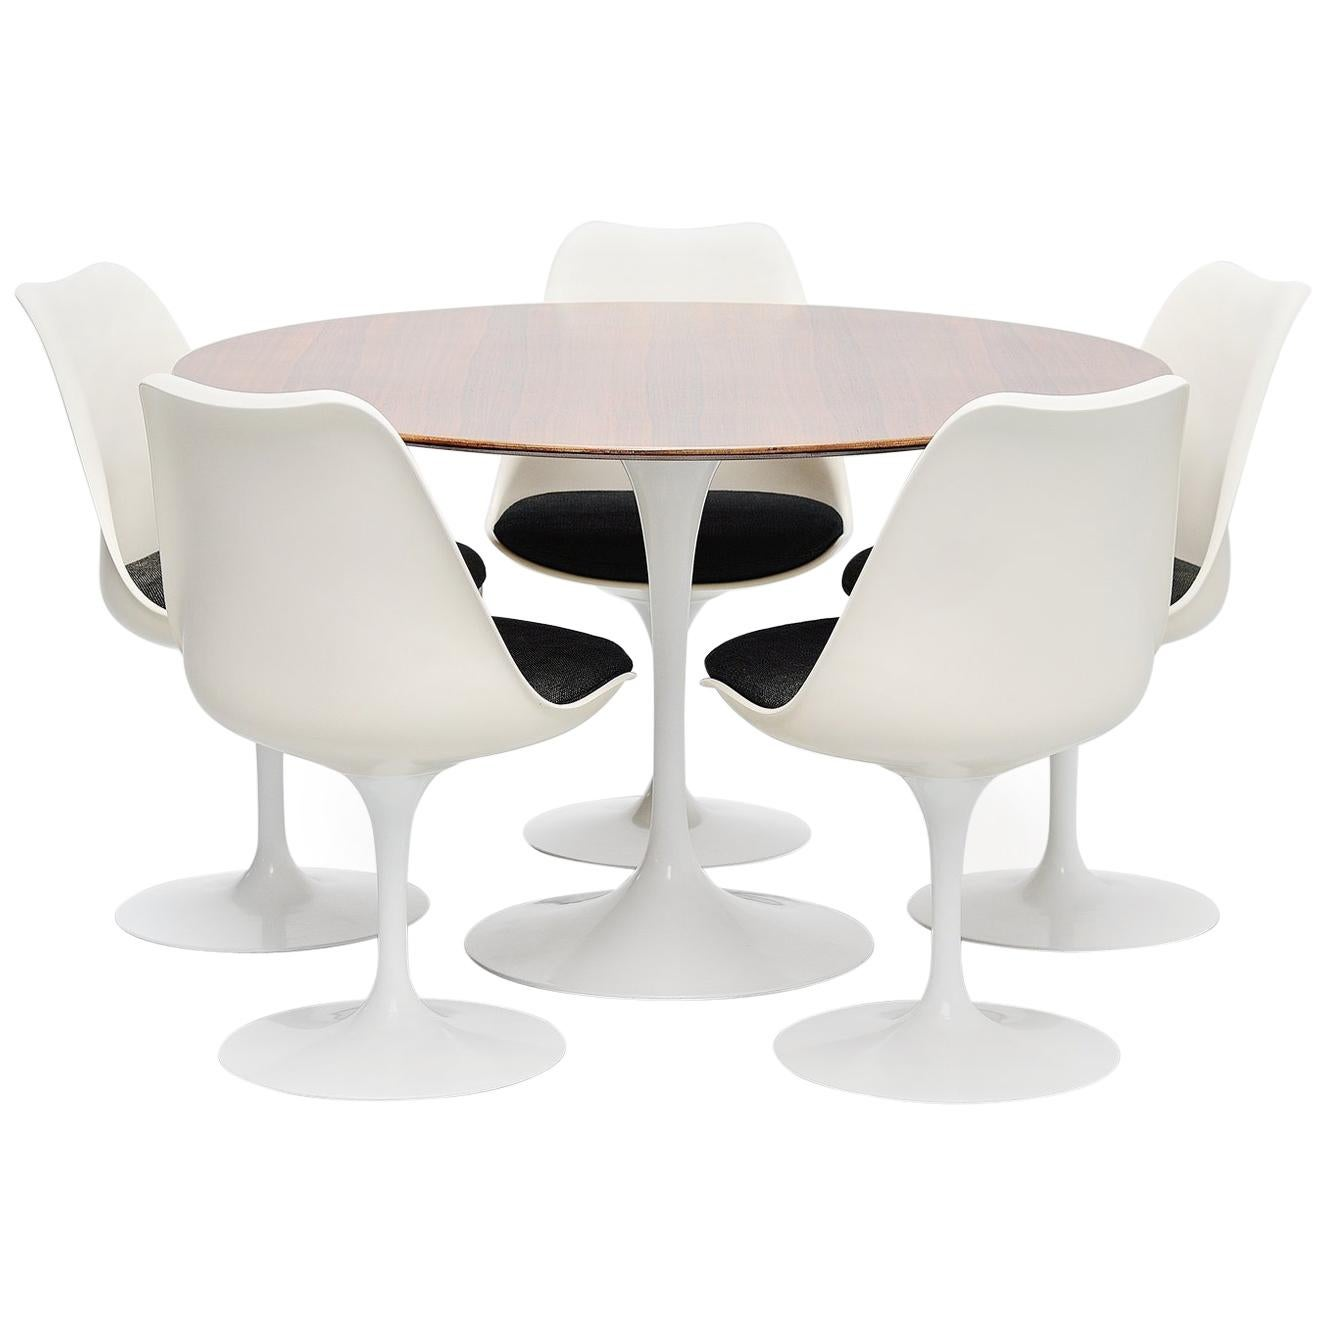 tulip table and chairs chair girls room eero saarinen set knoll international 1956 at 1stdibs for sale